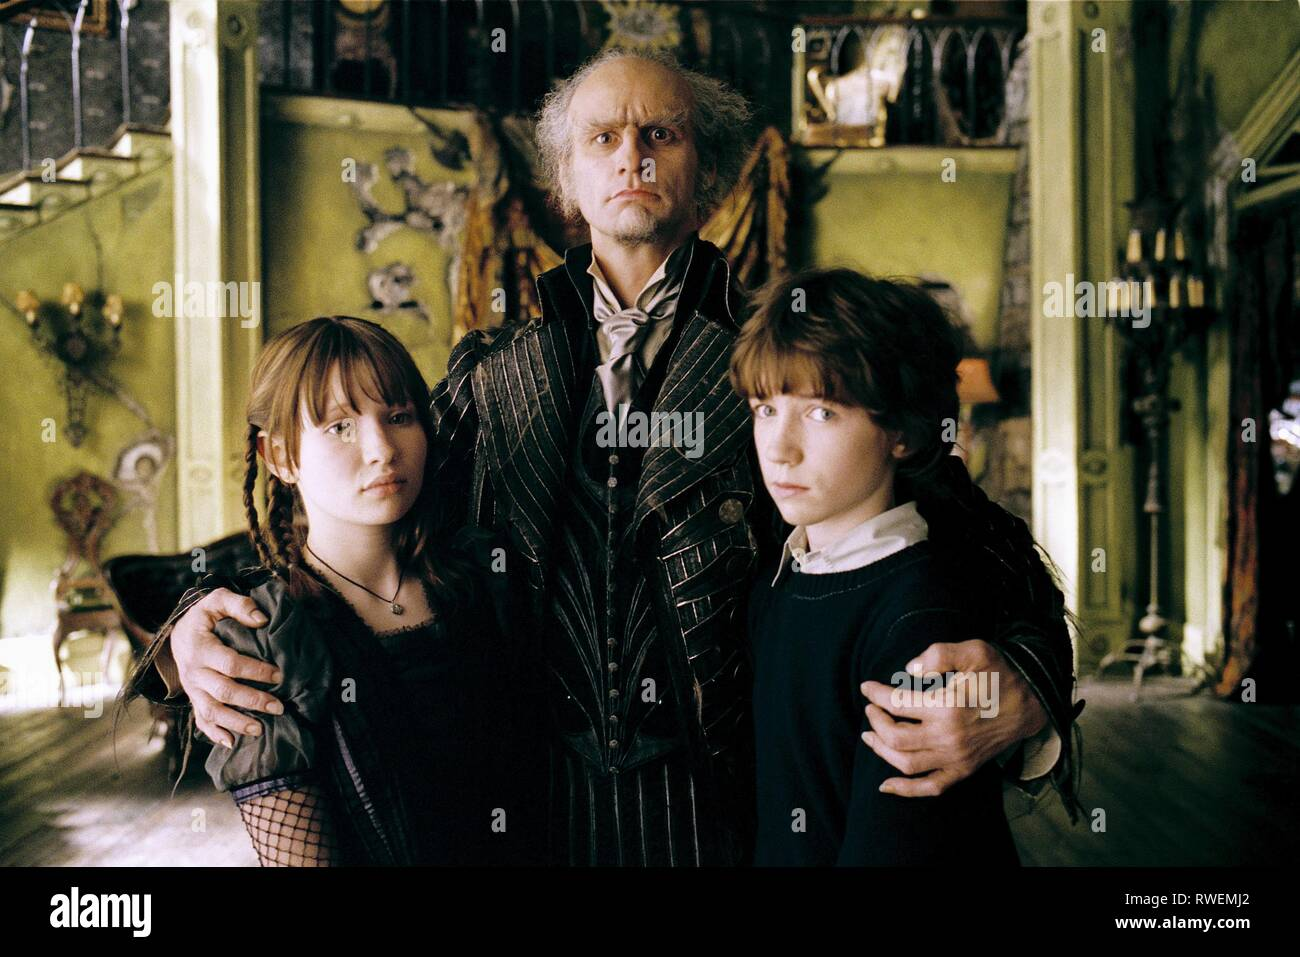 BROWNING,CARREY,AIKEN, Lemony Snicket una serie di sfortunati eventi, 2004 Immagini Stock